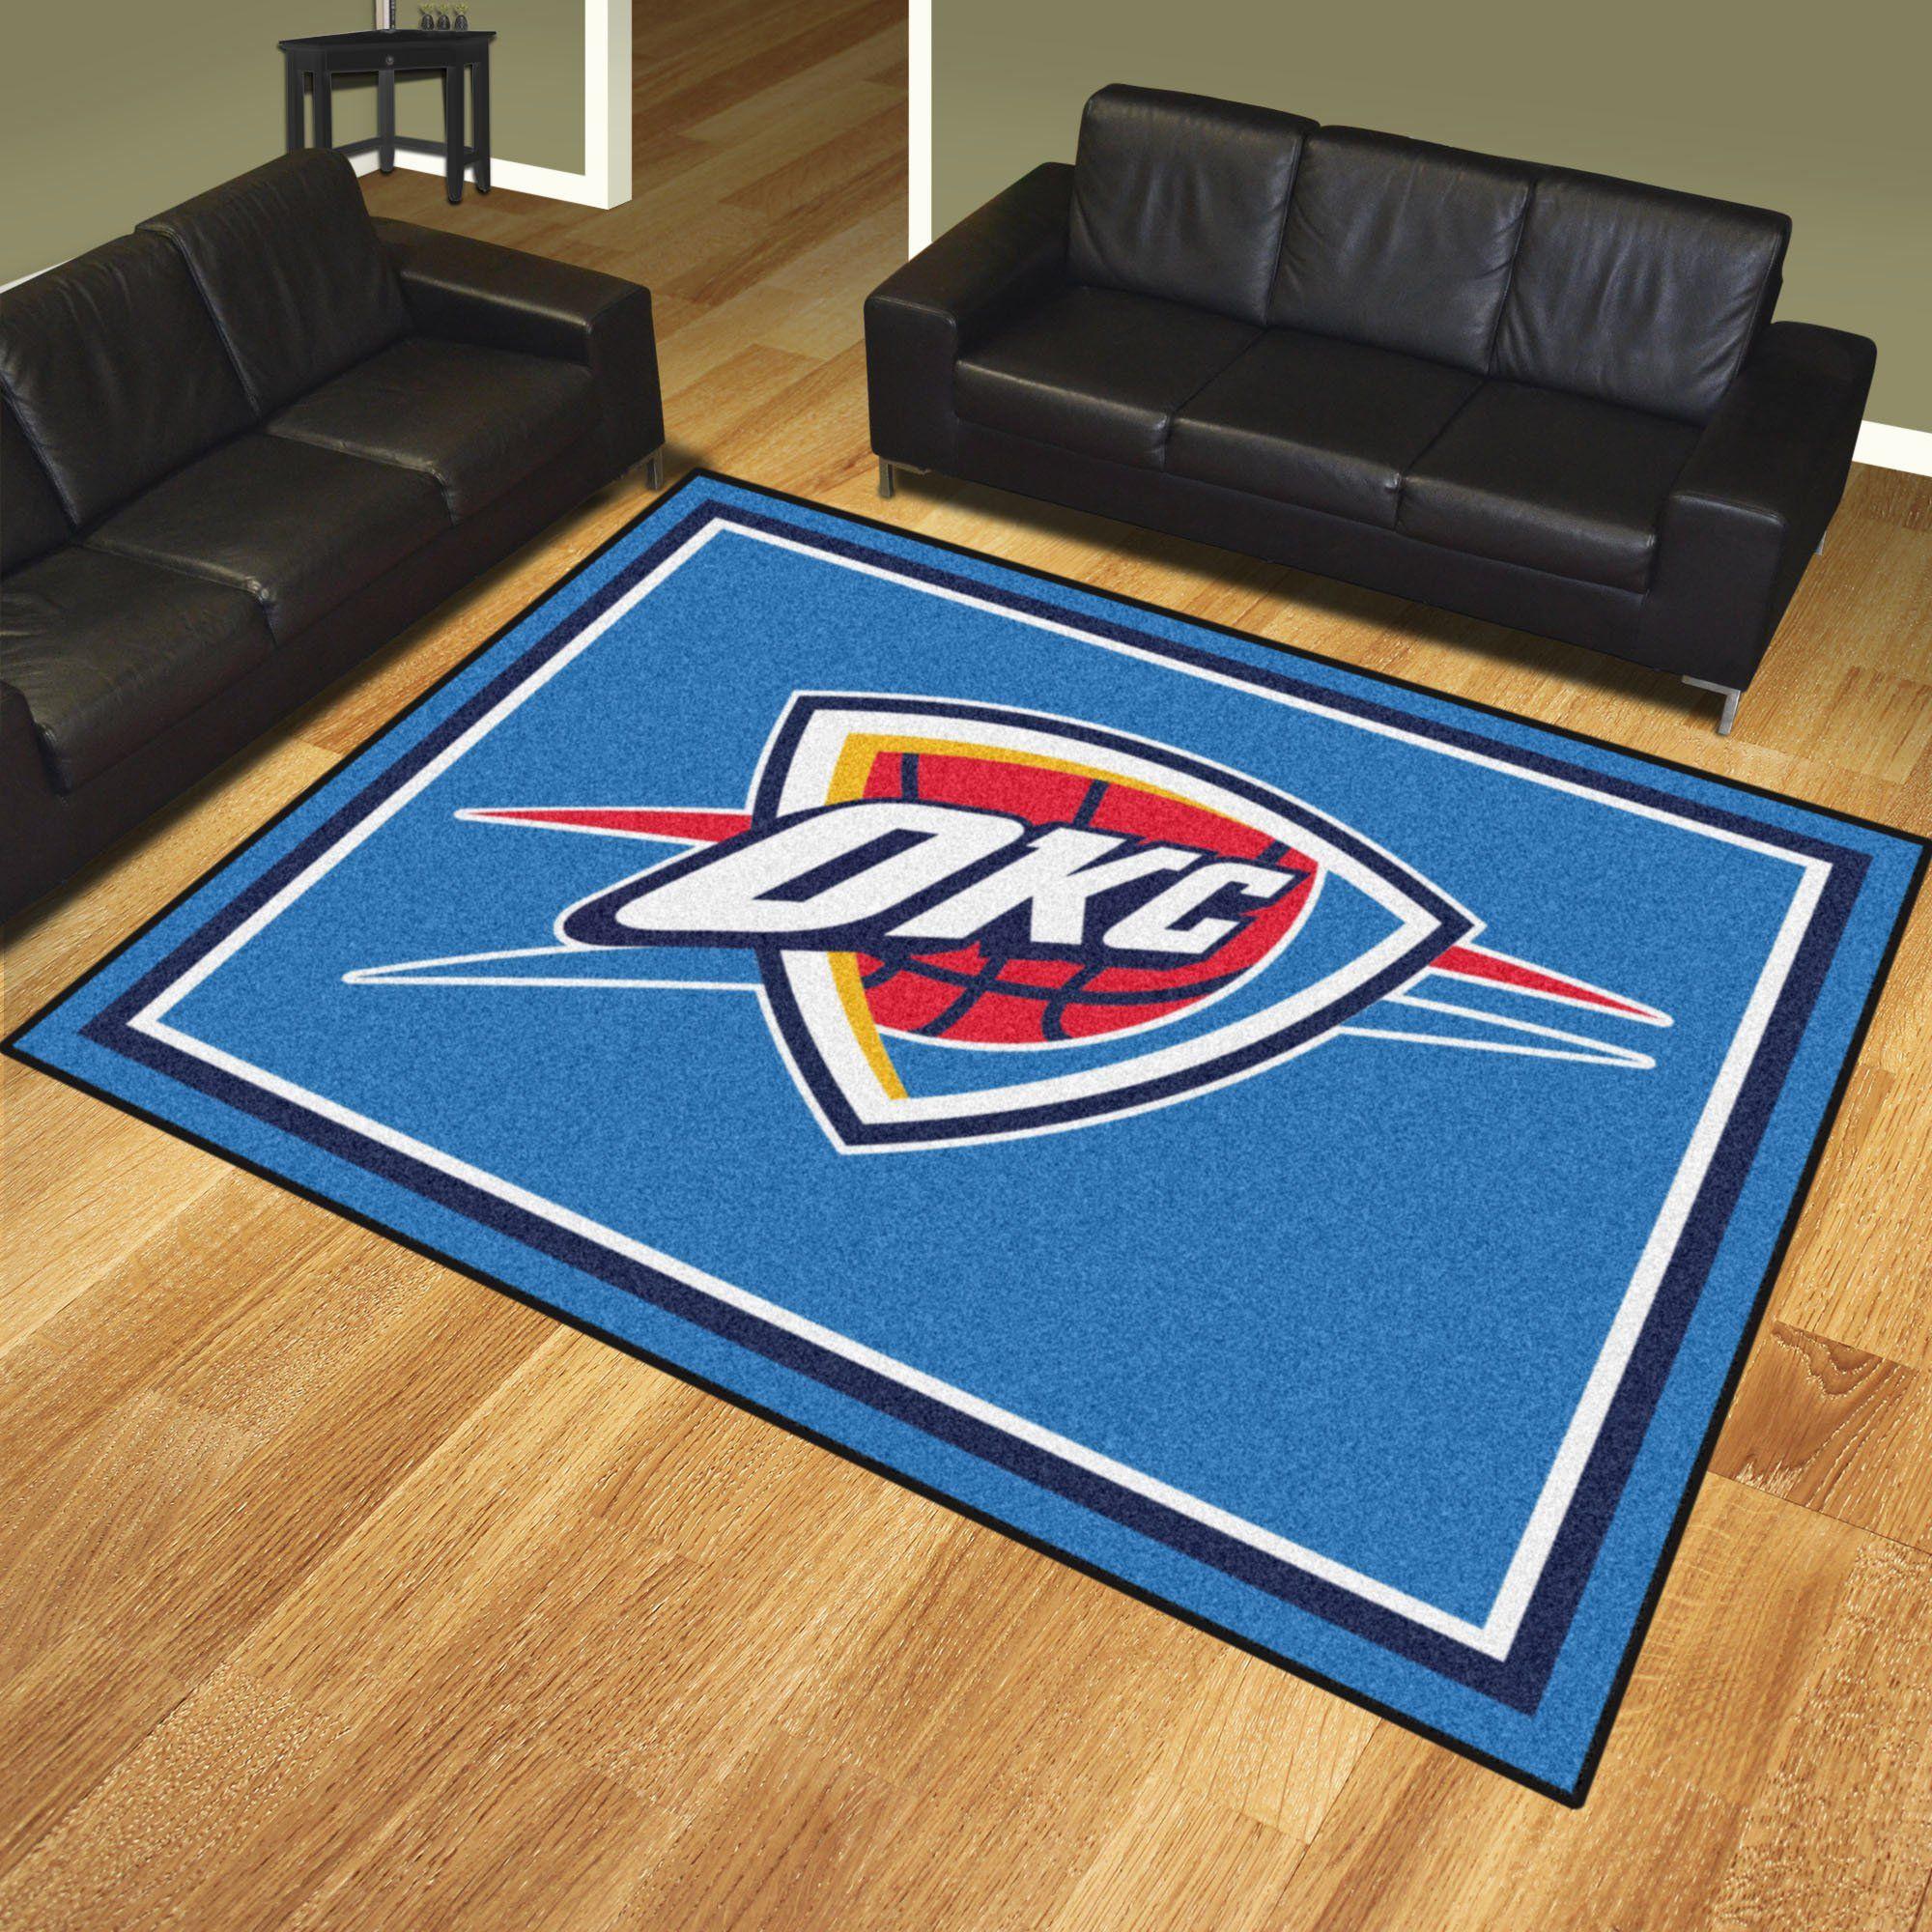 Nba Oklahoma City Thunder 8 X10 Rug Products Rugs 8x10